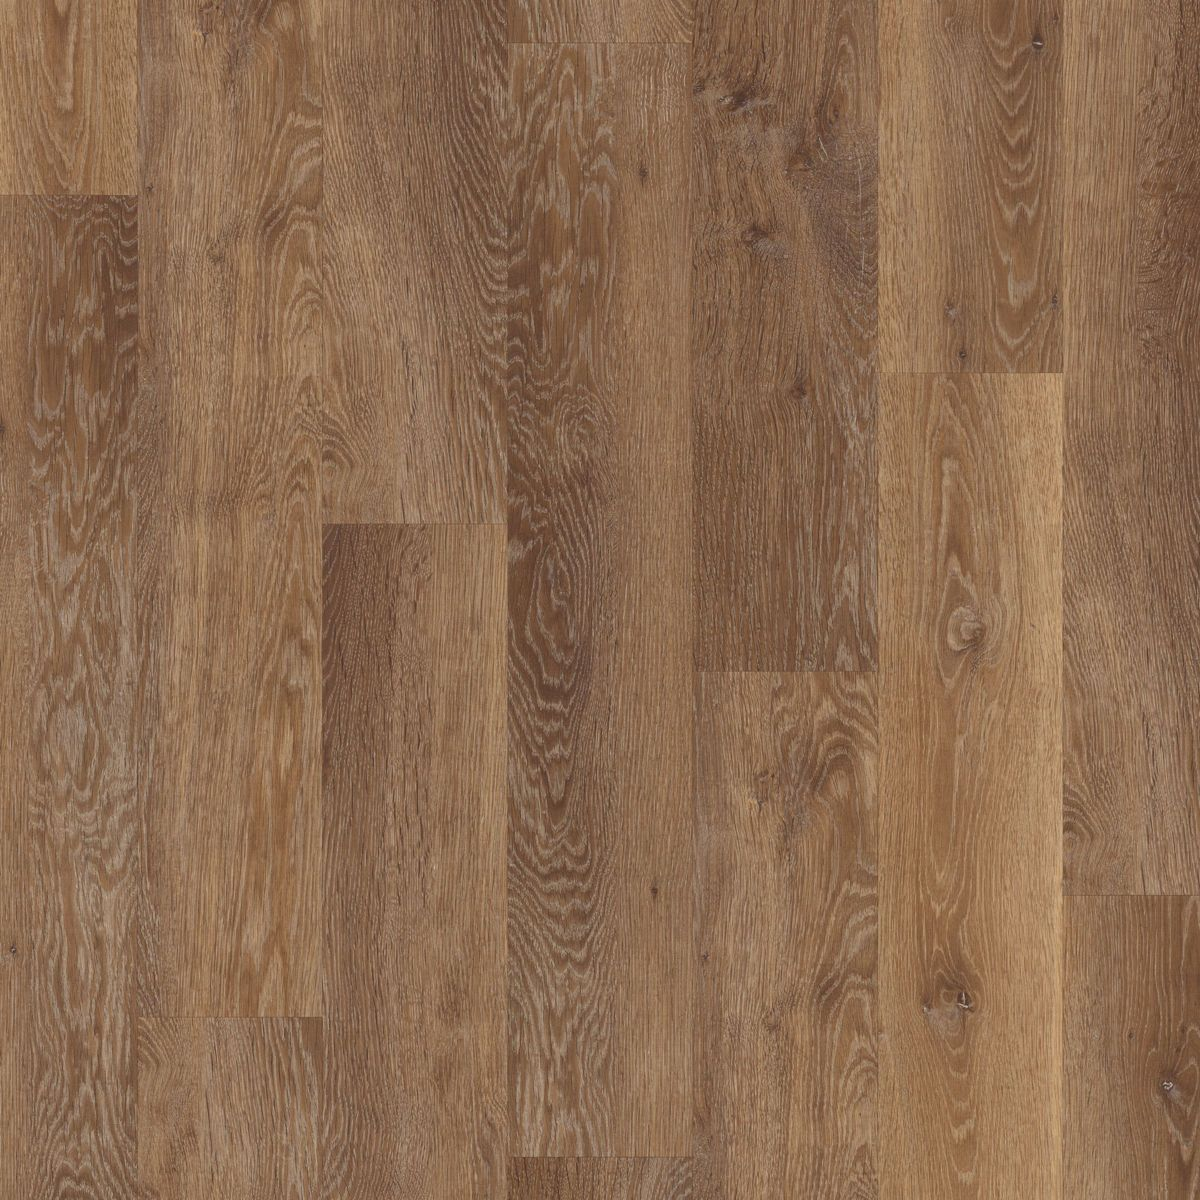 Karndean Knight Tile Mid Limed Oak KP96 Vinyl Flooring